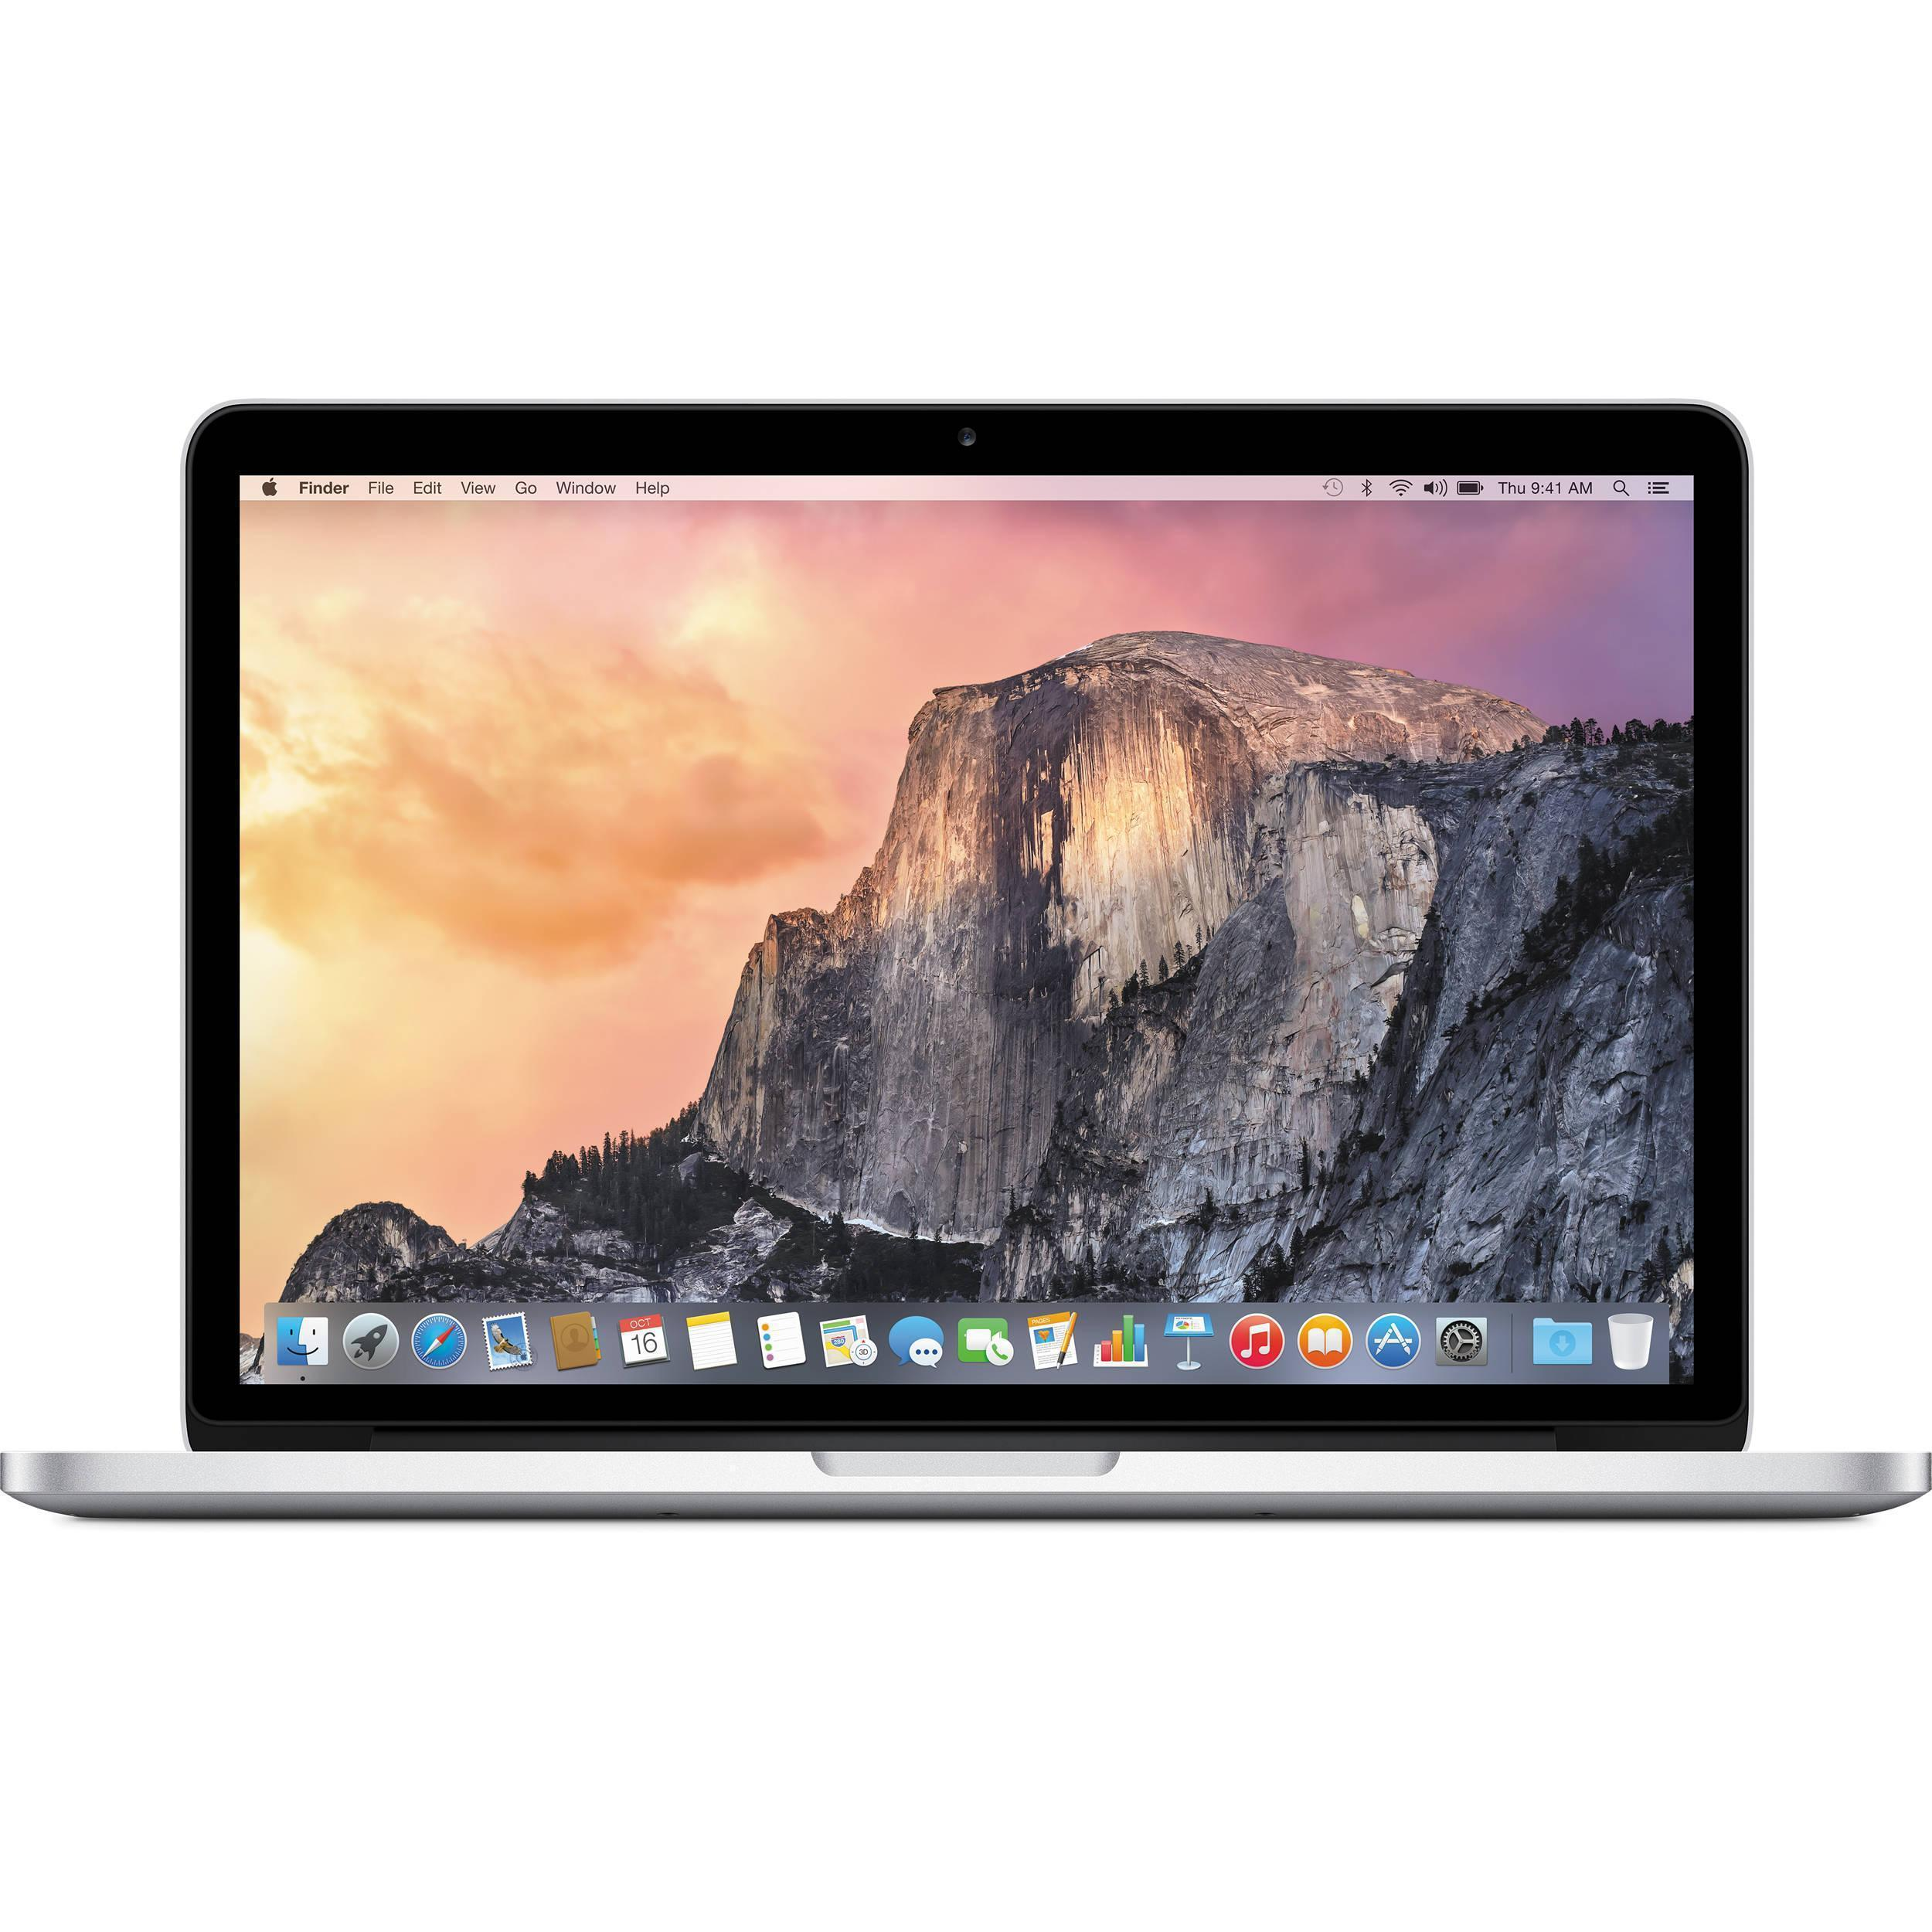 MacBook Pro Retina 13.3-inch (2013) - Core i7 - 8GB - SSD 256 GB QWERTY